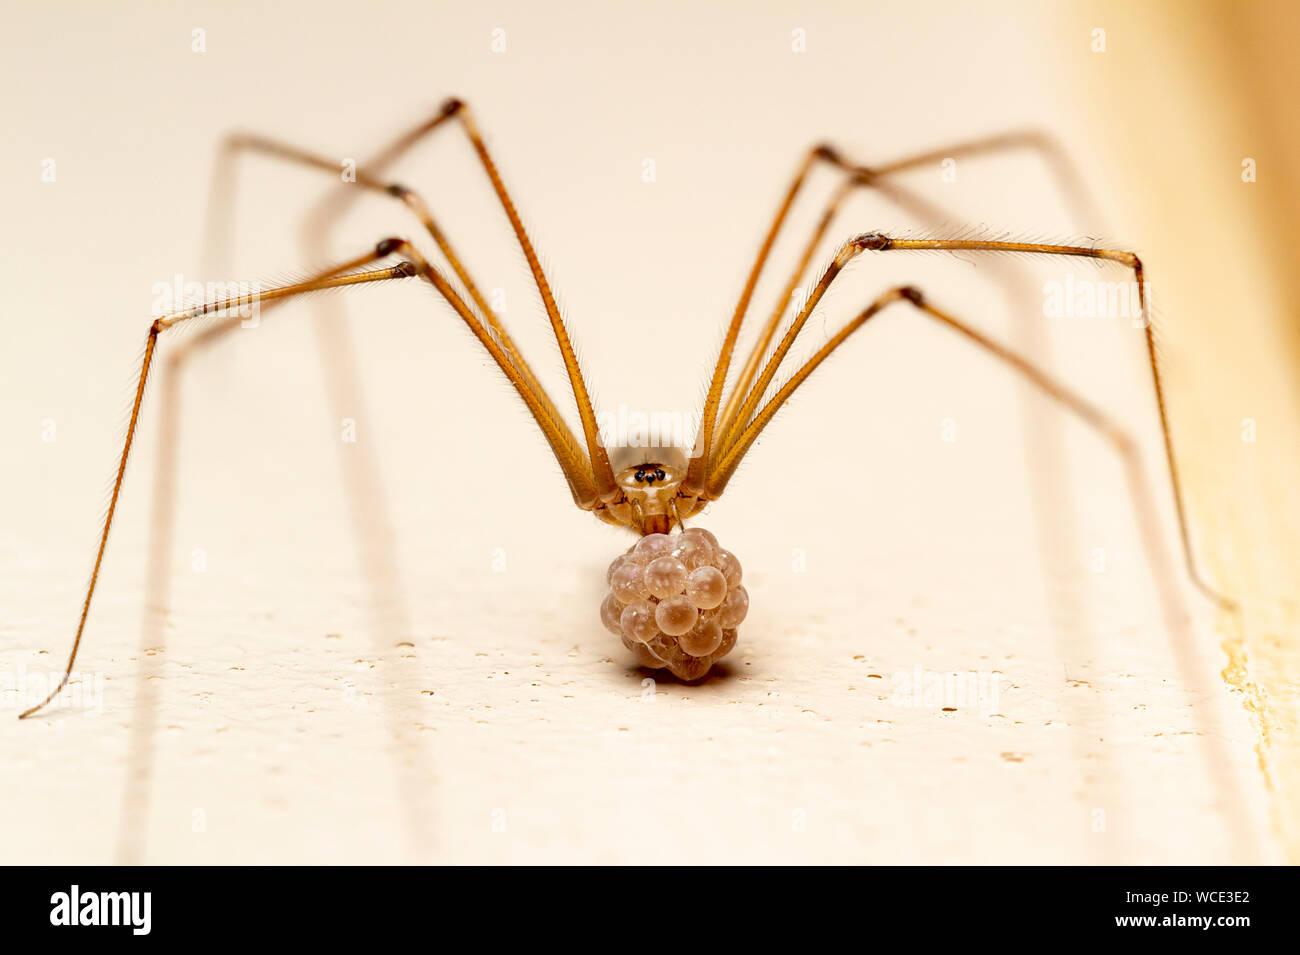 Keller Spinne mit ihrem Eier (Pholcus phalangioides) Stockfoto